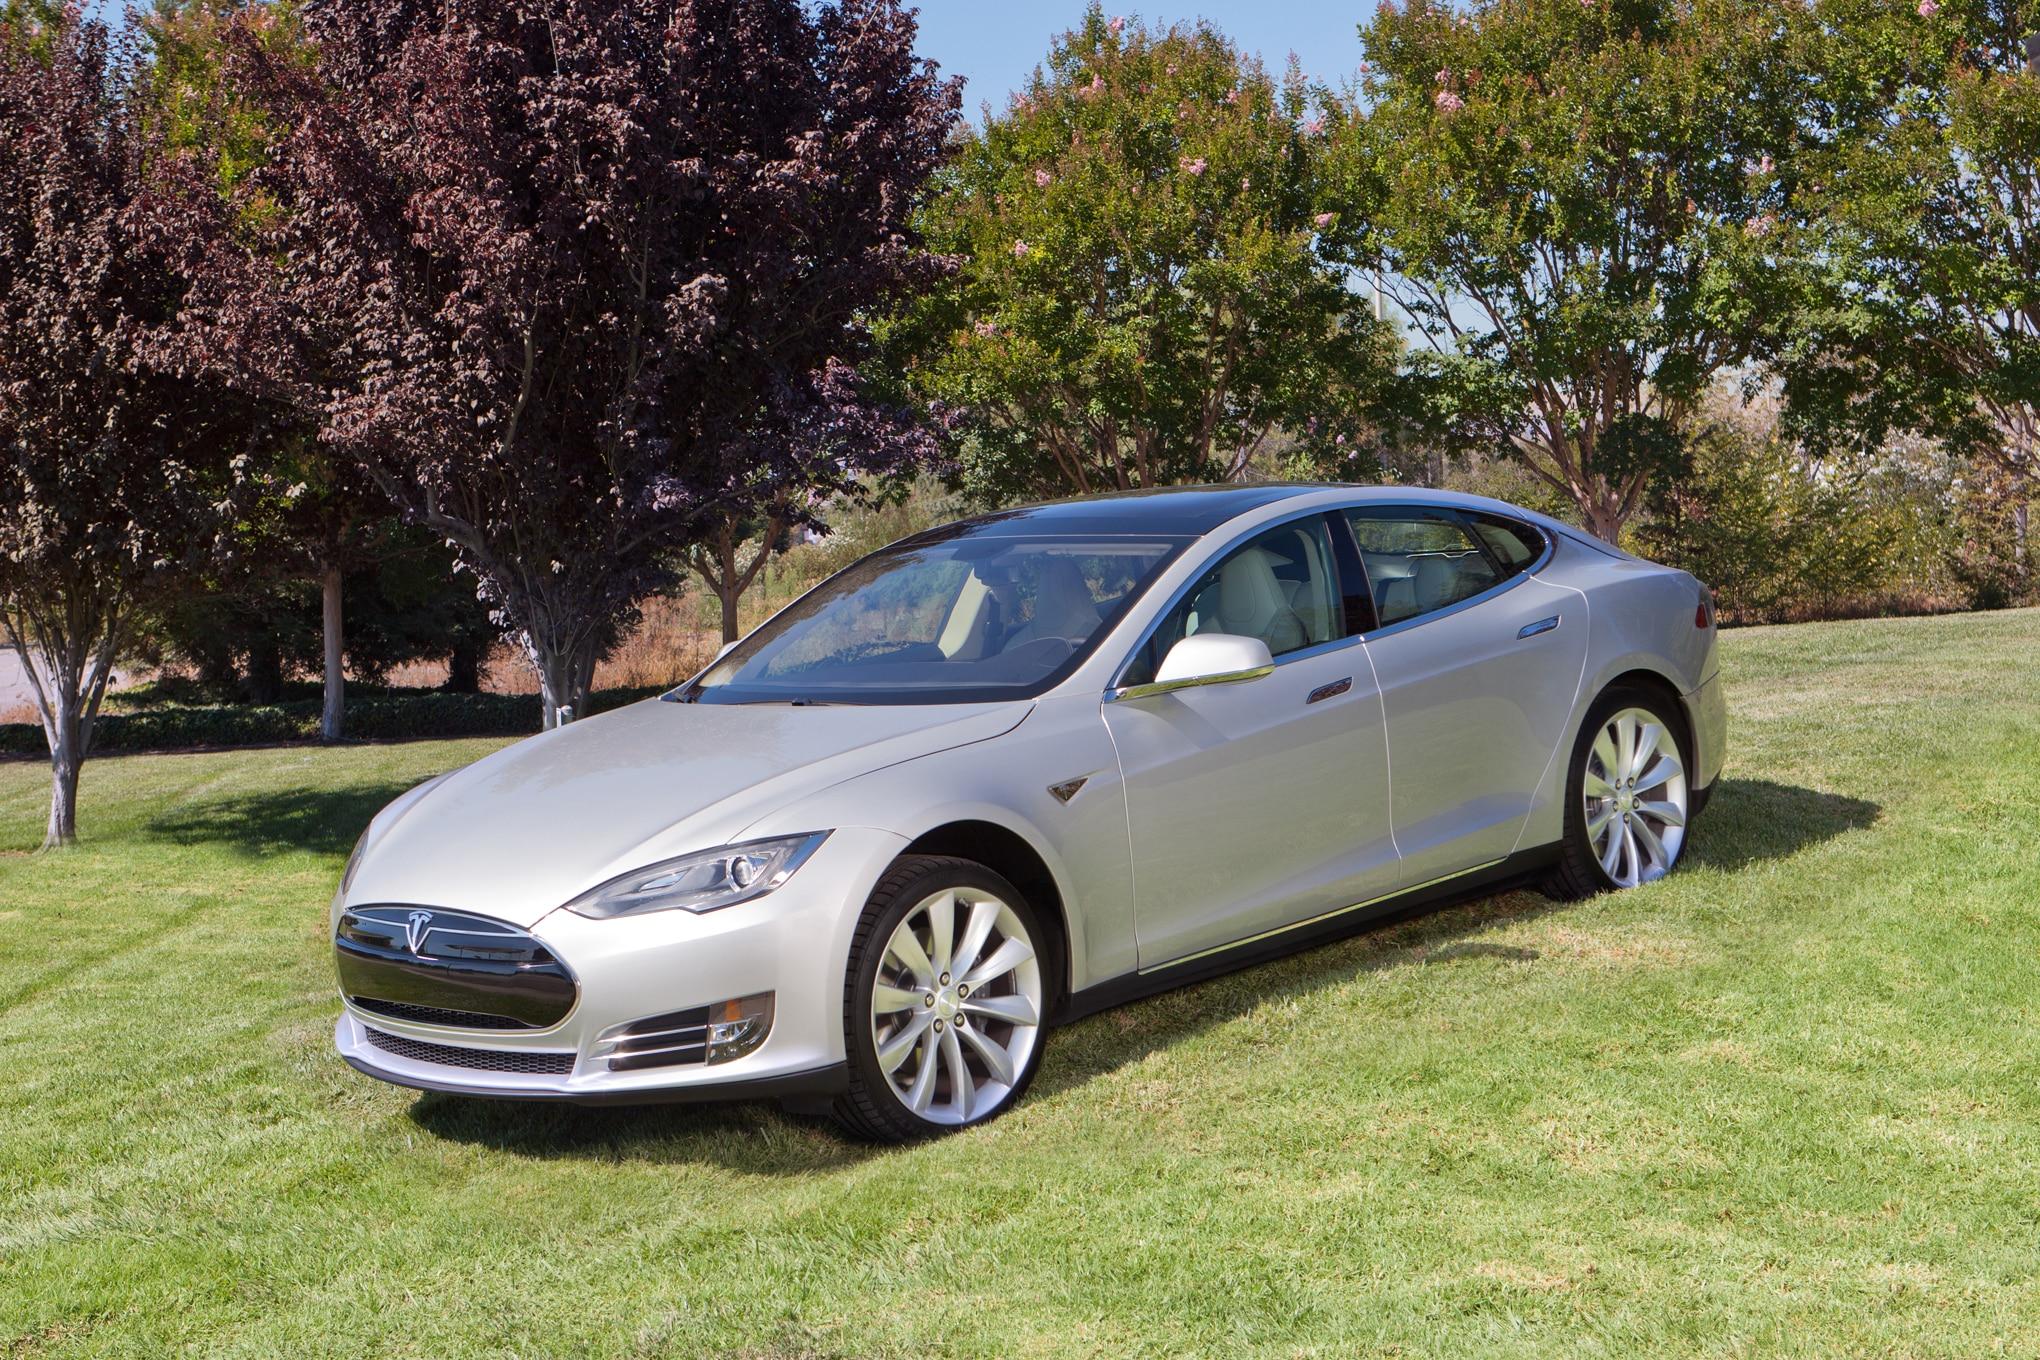 Latest Tesla Software Update >> Tesla Model S Software Update 6.2 Helps Avoid Range Anxiety